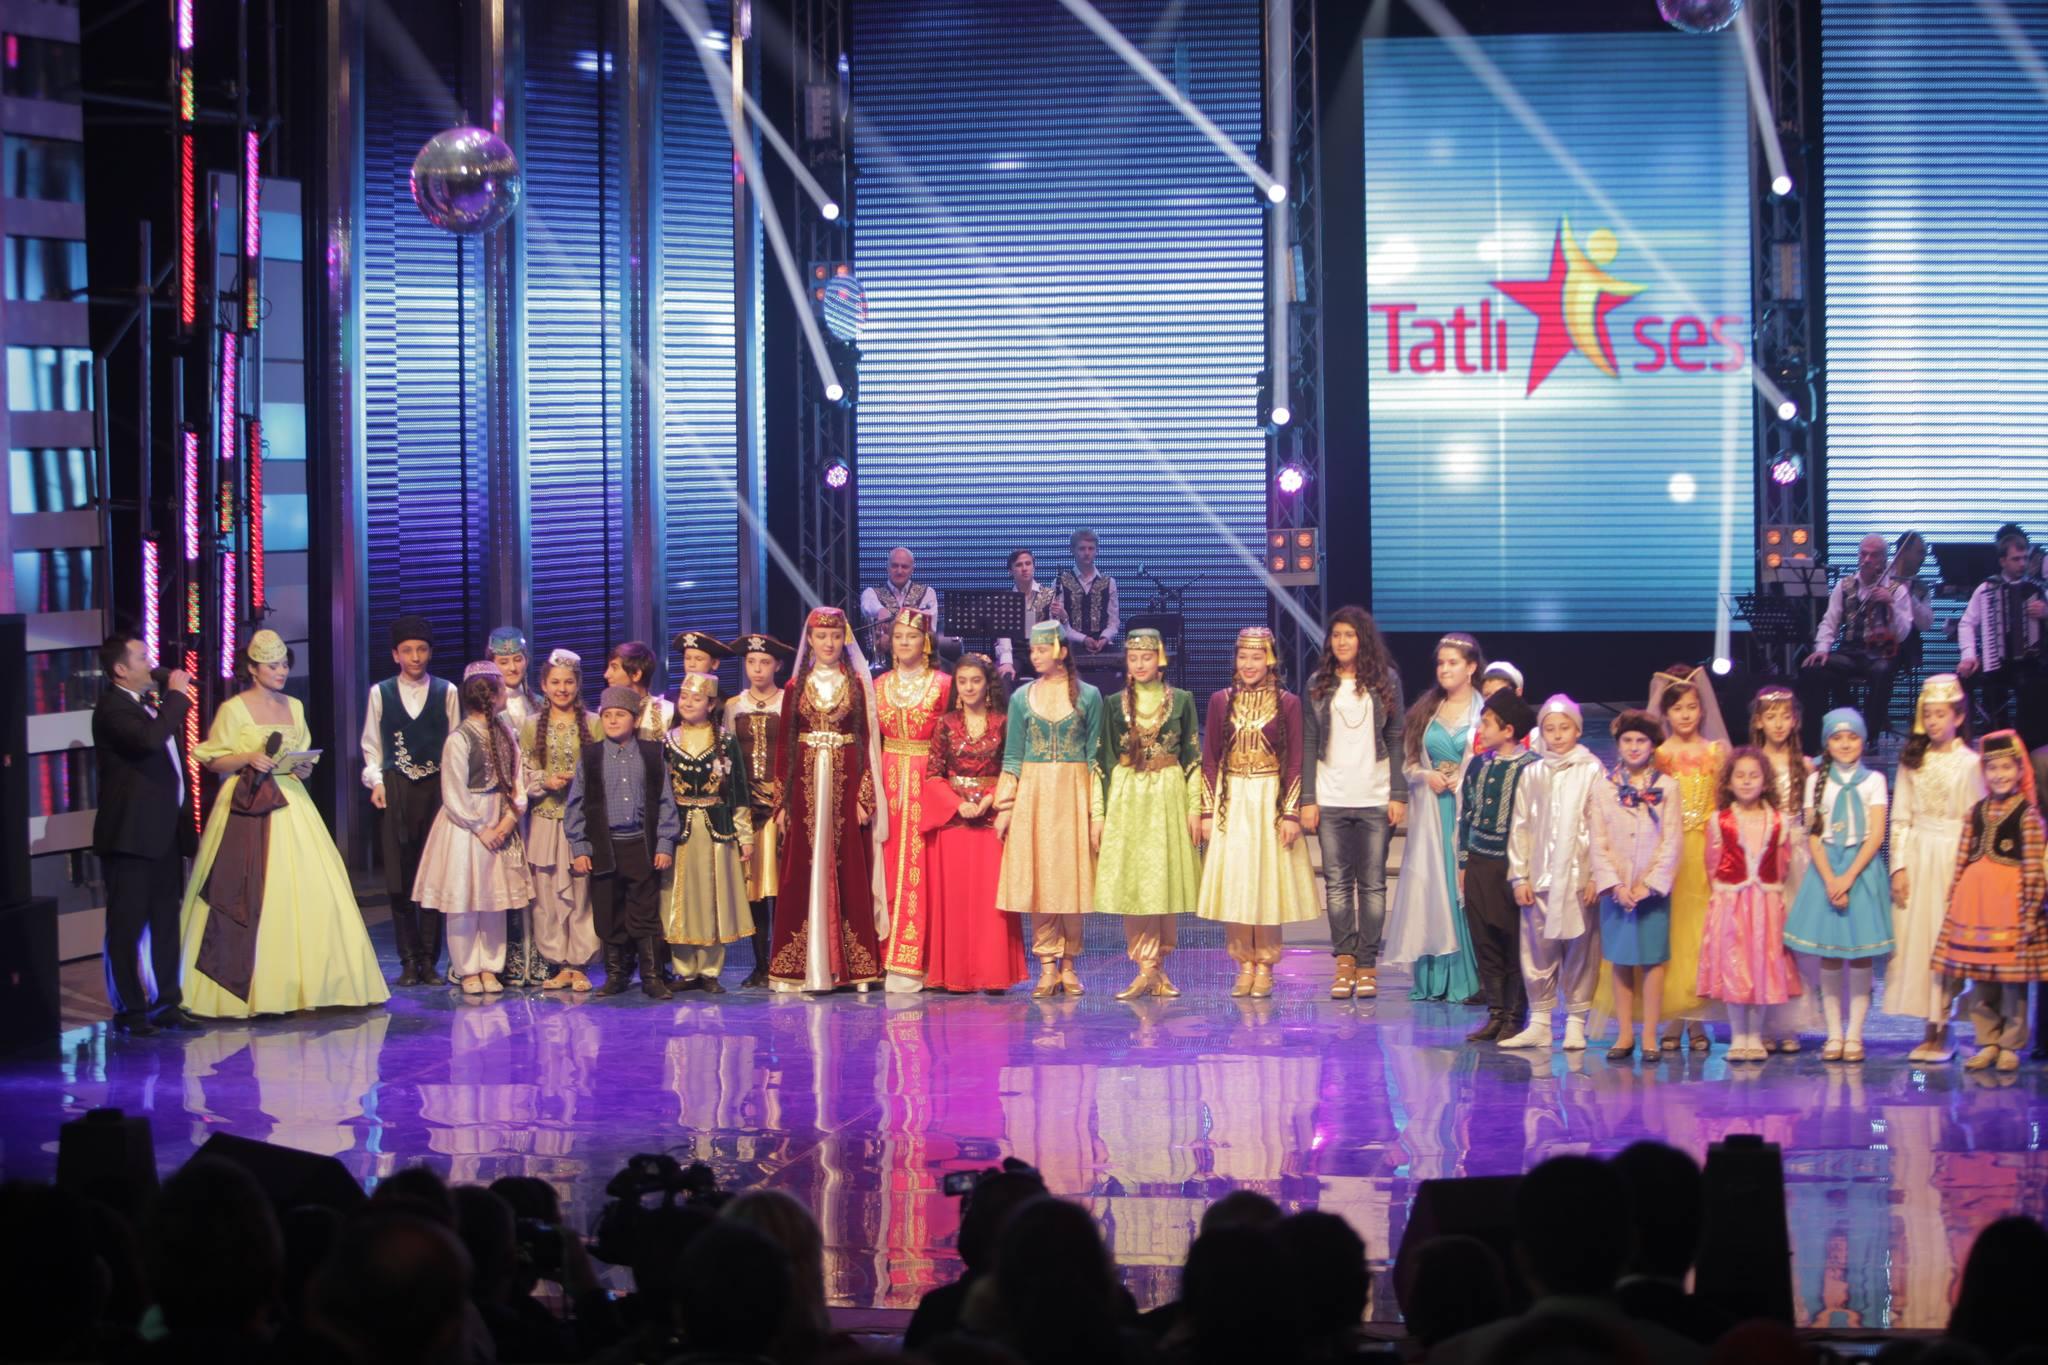 В Симферополе наградили  победителей Tatlı ses (фото)